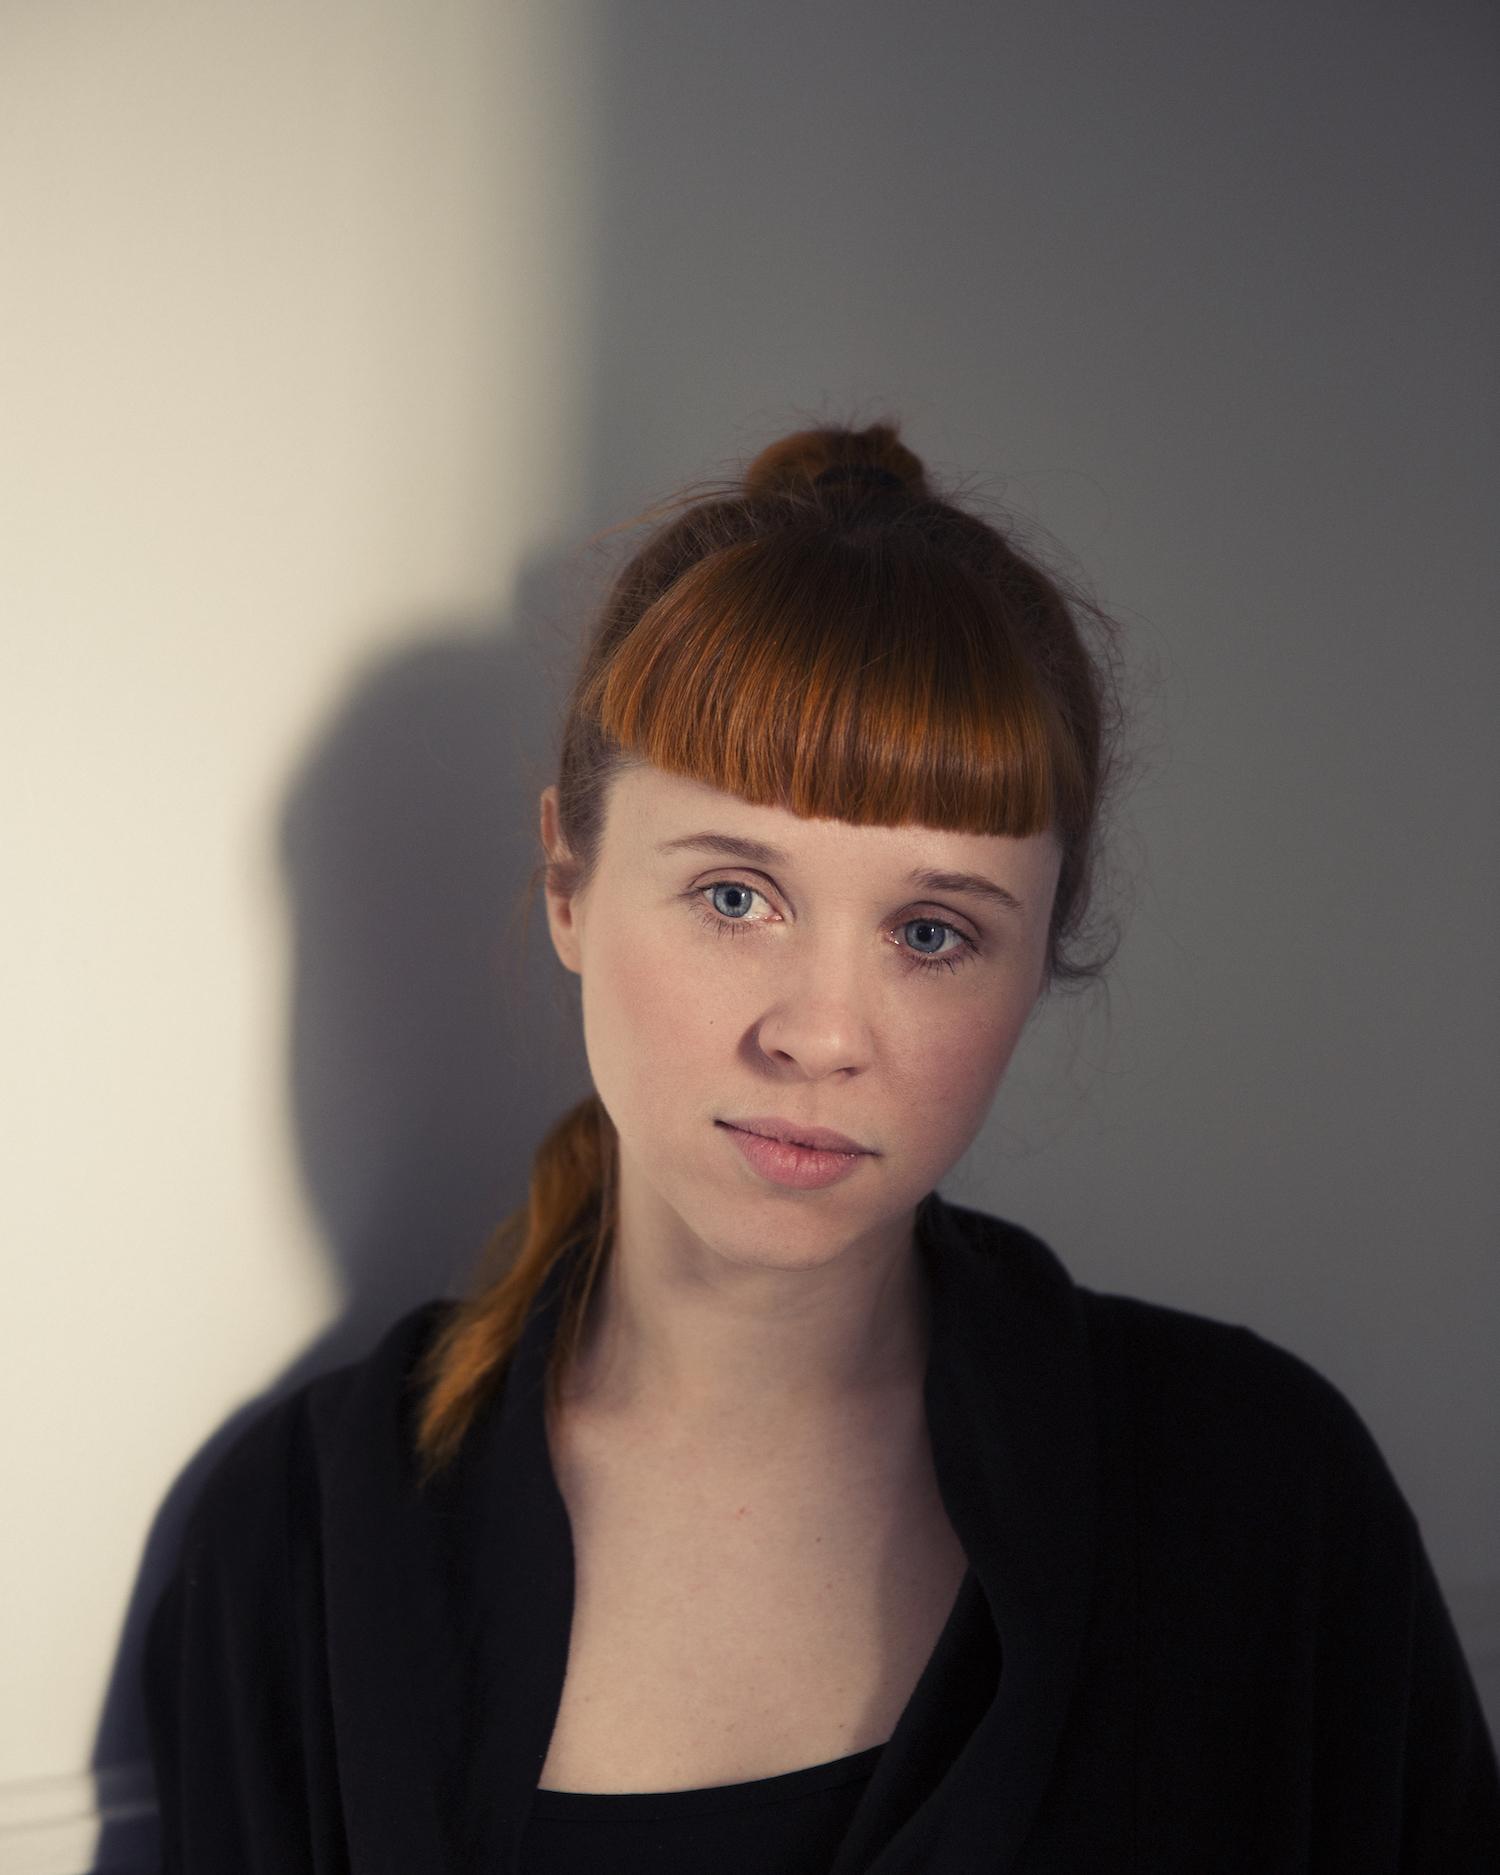 Holly Herndon